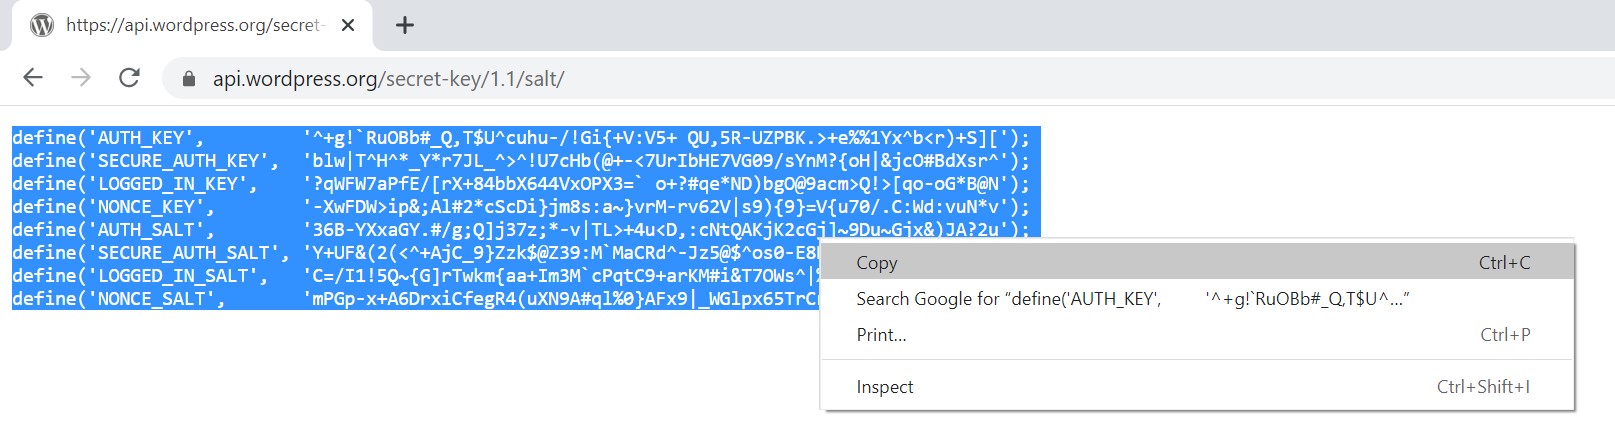 Generating new WordPress salts and security keys.